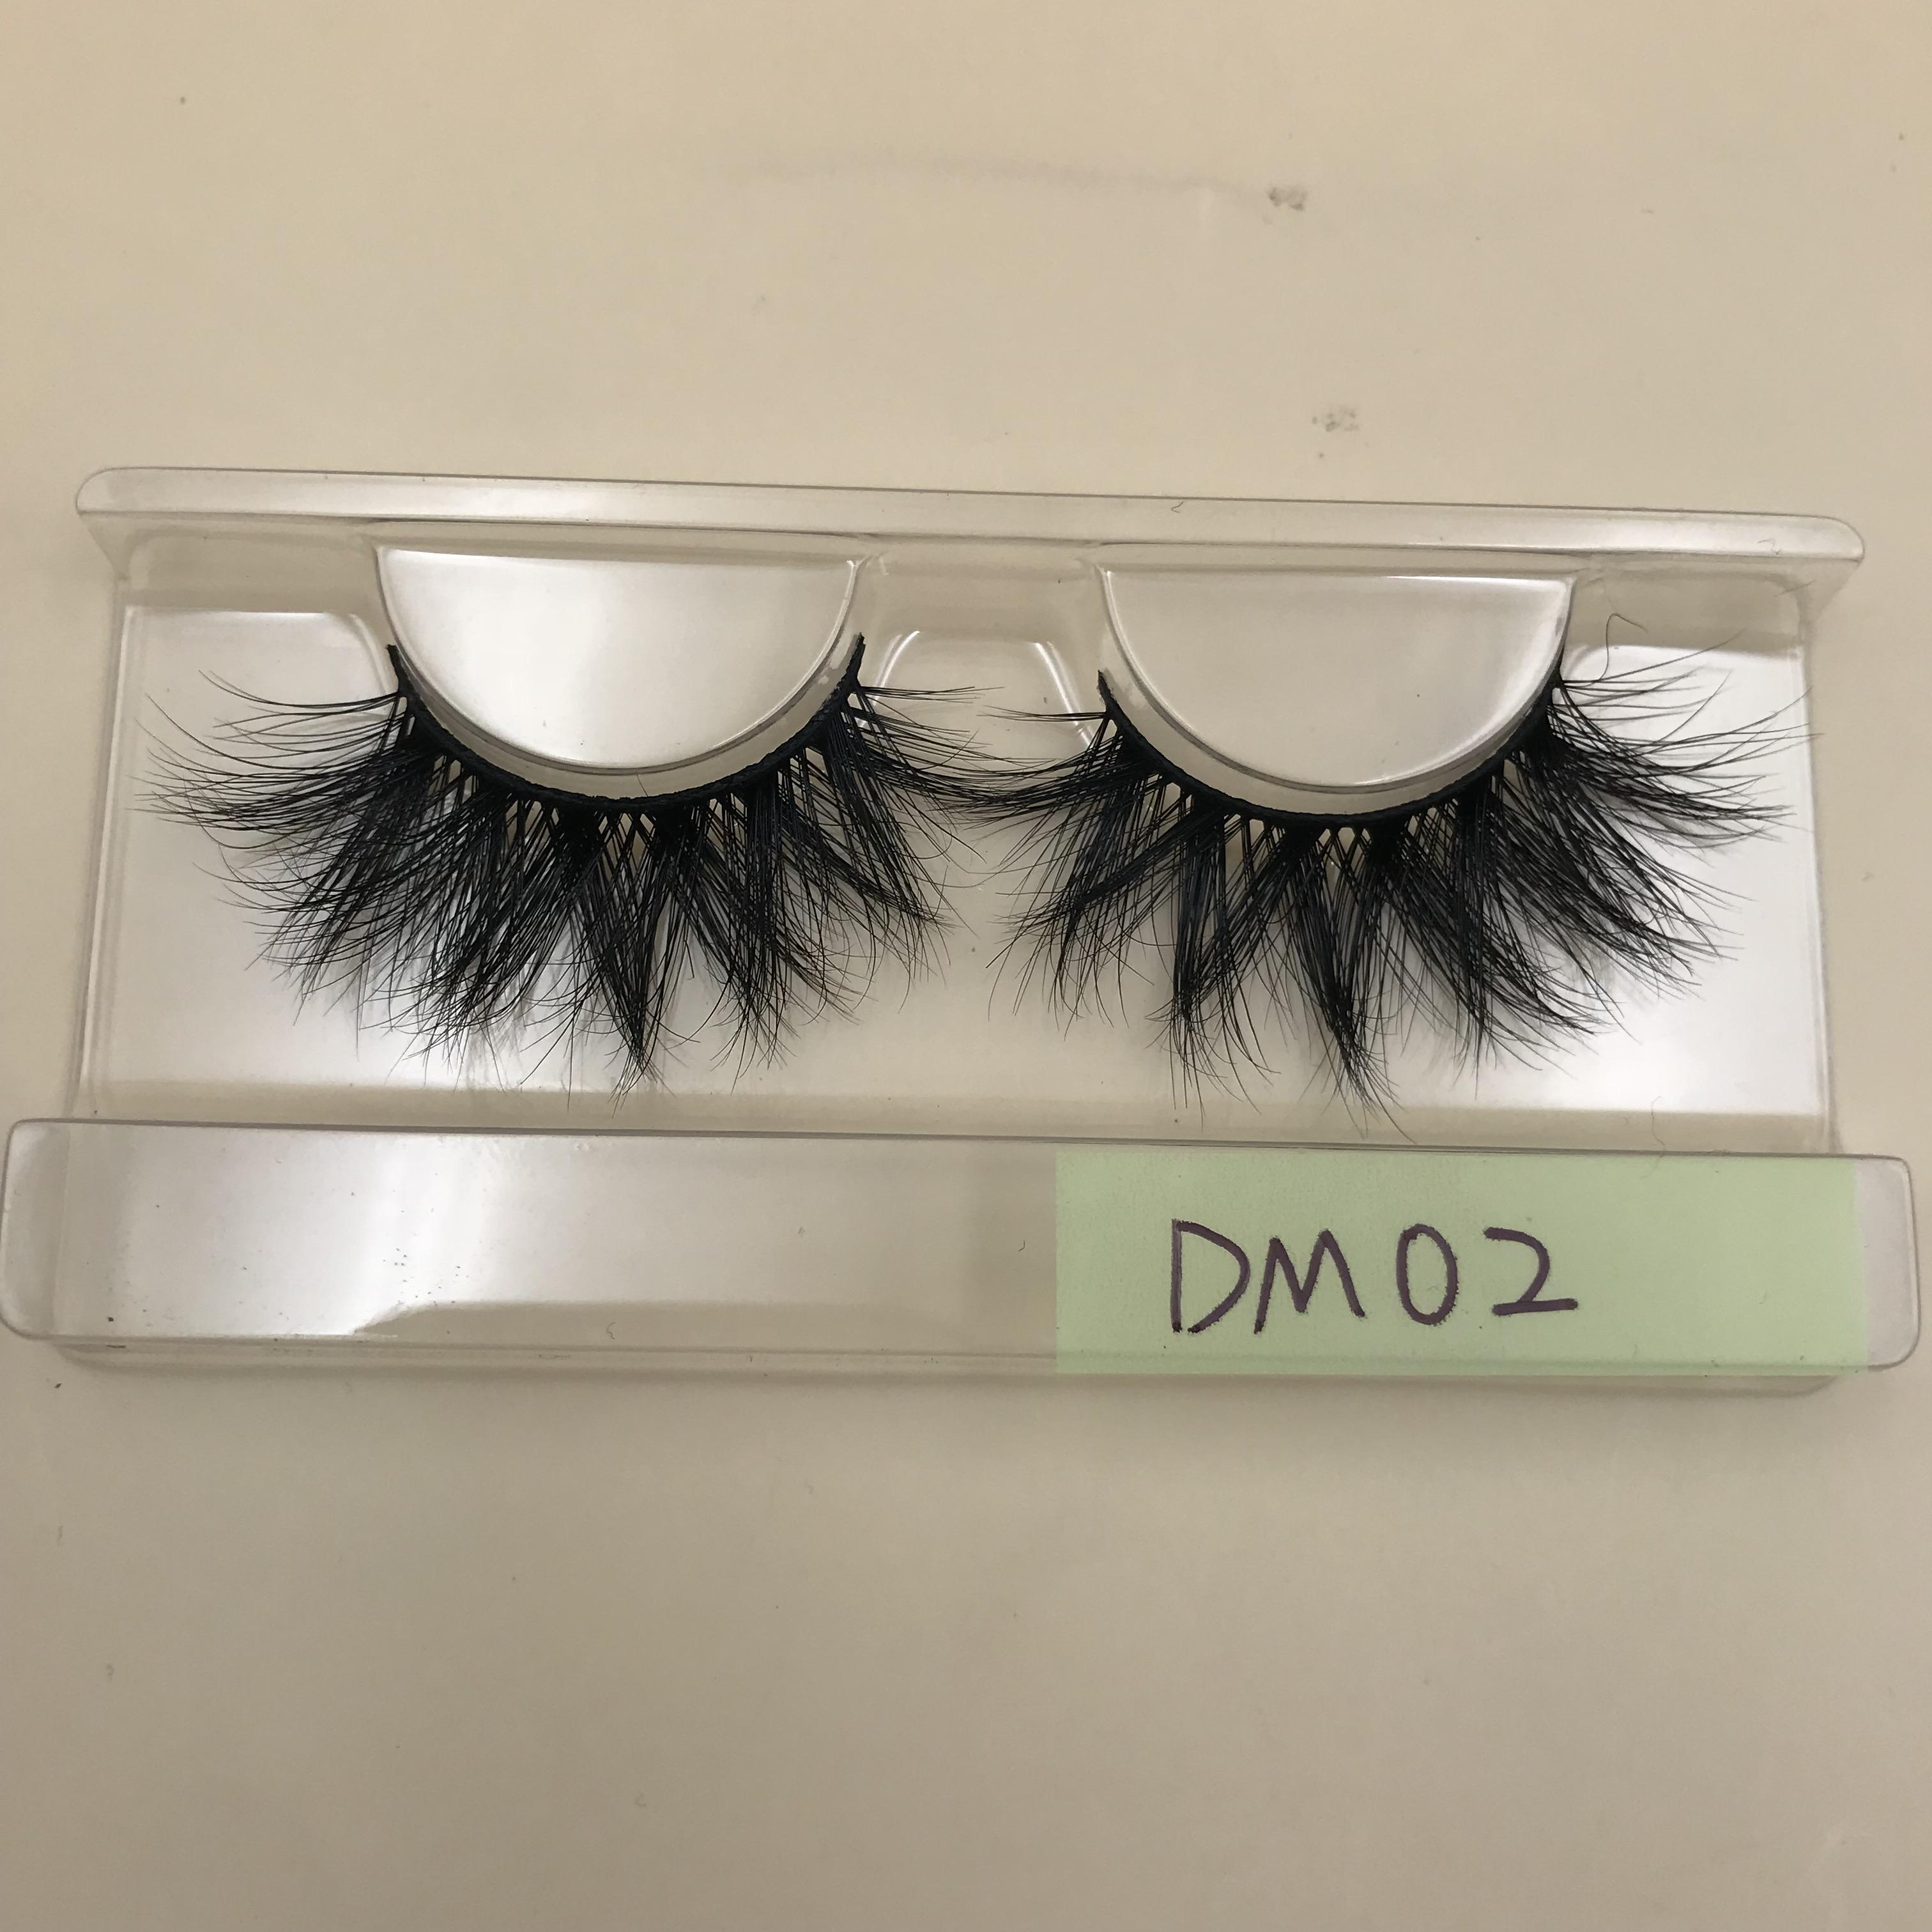 DM02 20mm Mink Lashes